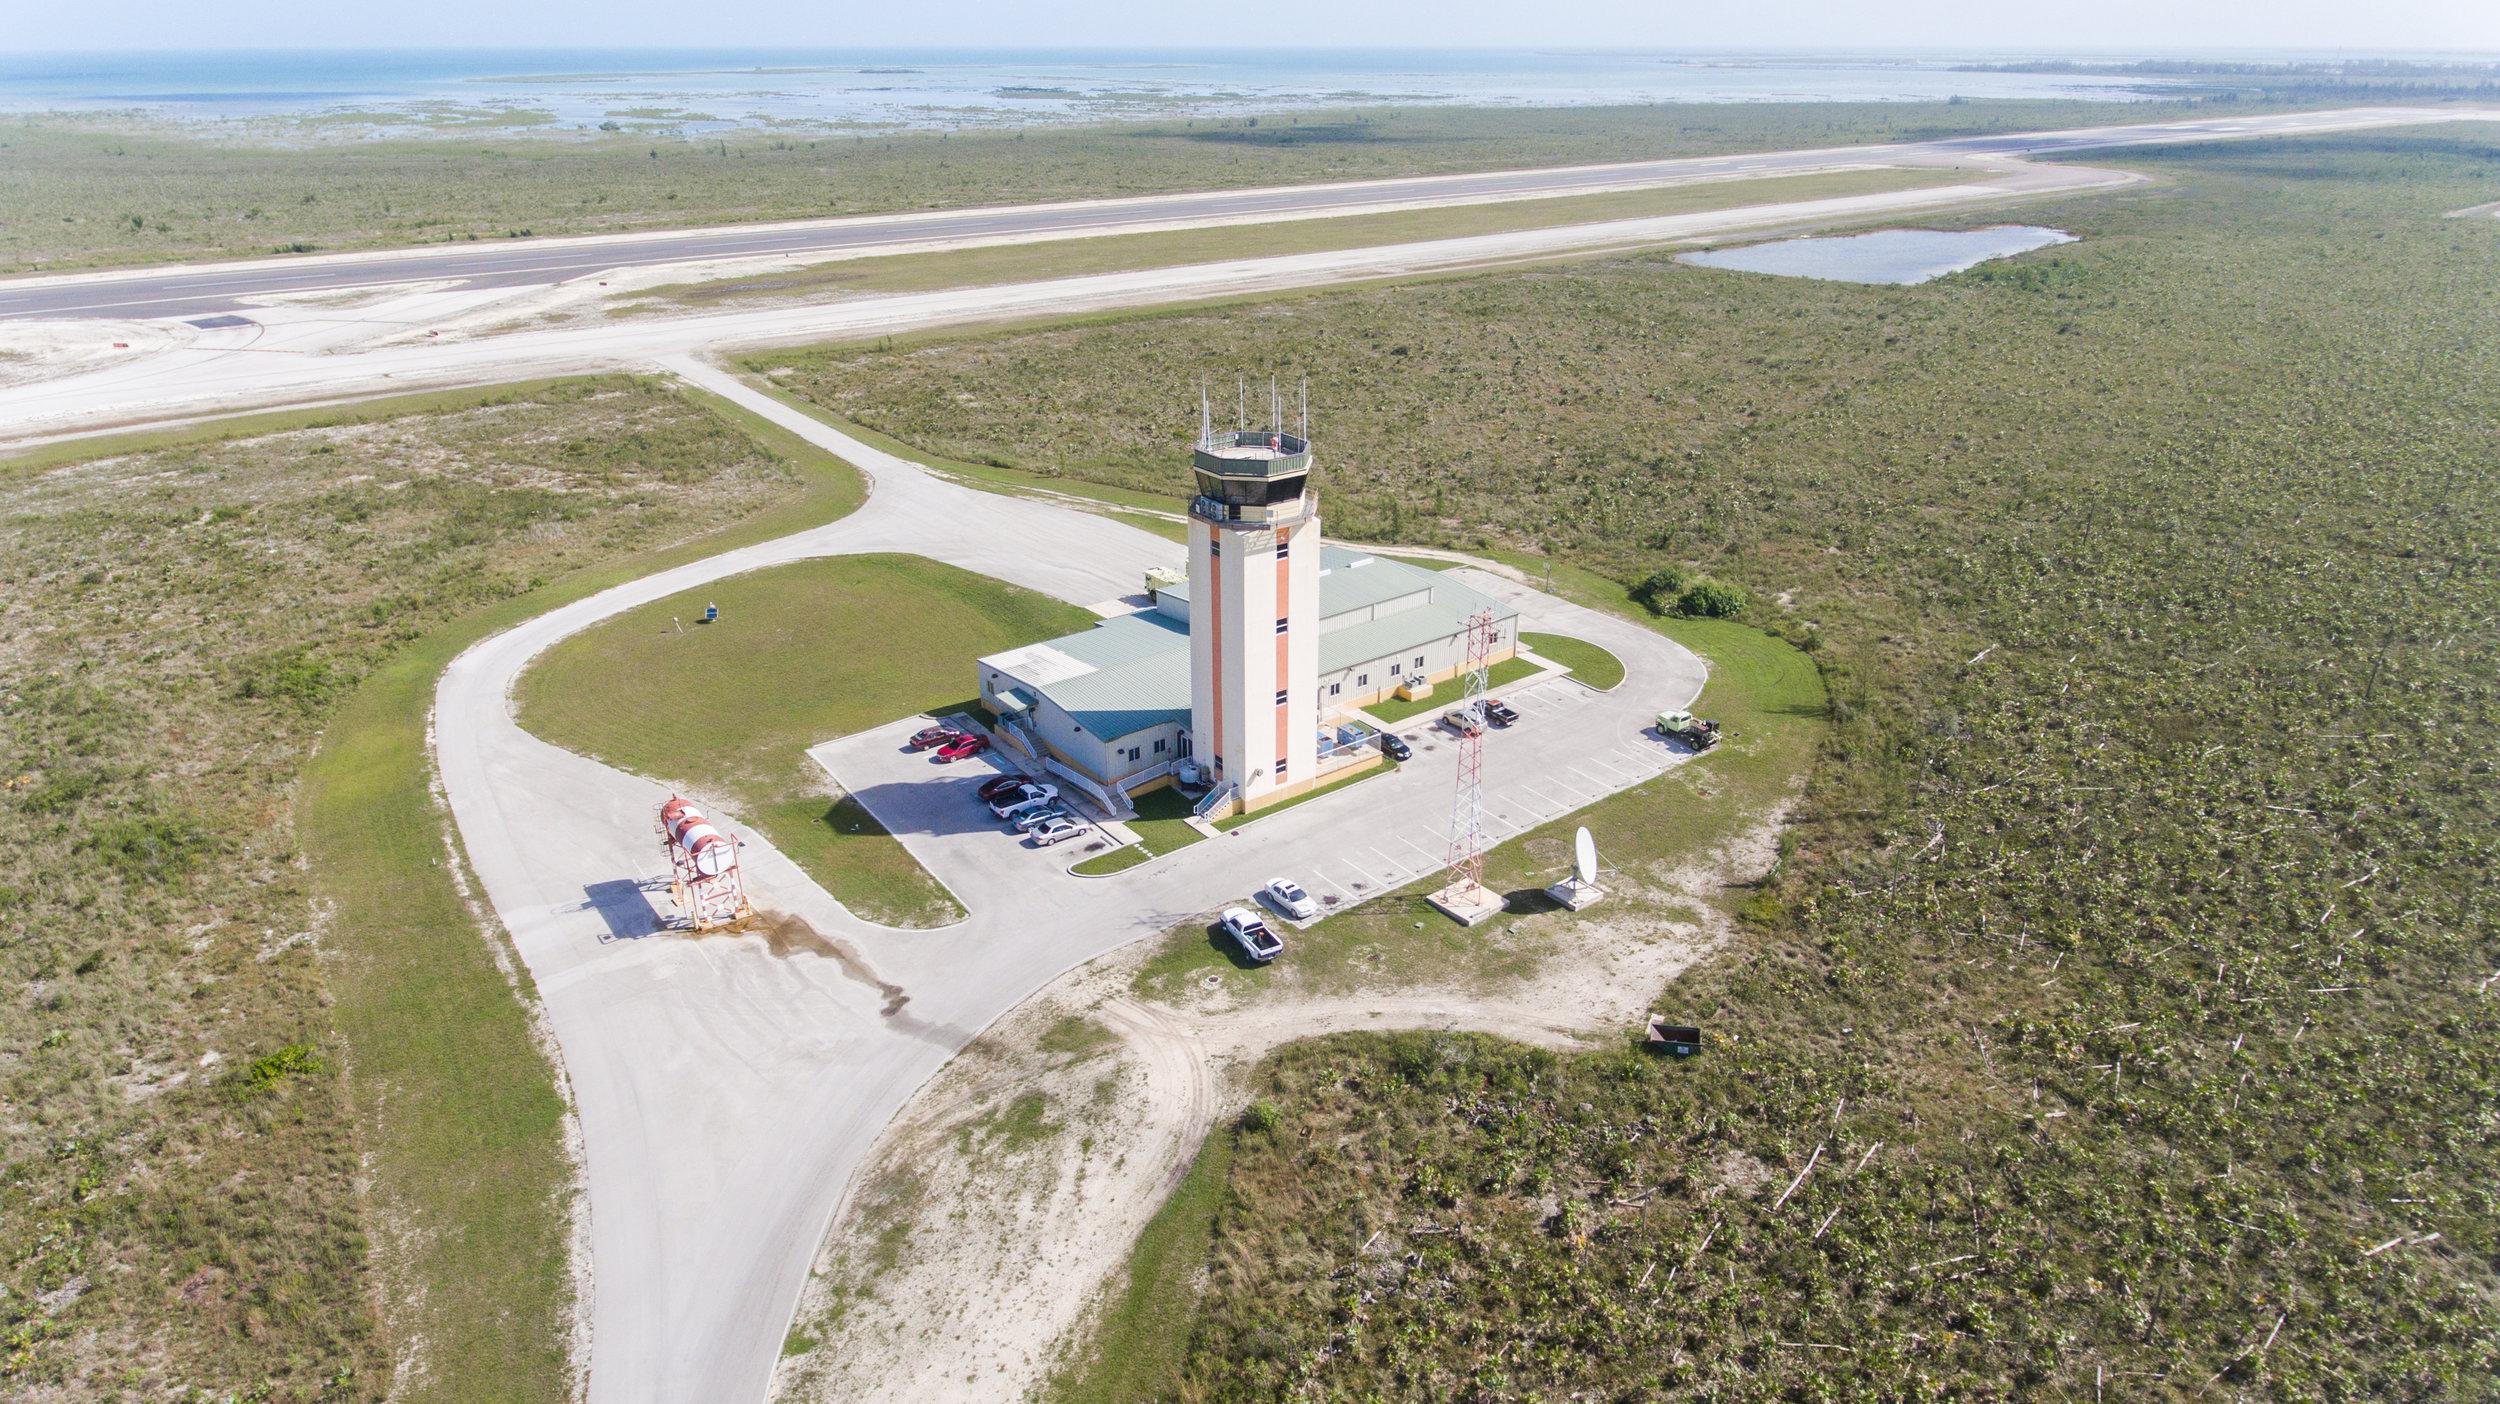 Grand Bahama International Airport Control Tower - Photo: Erik J. Russell